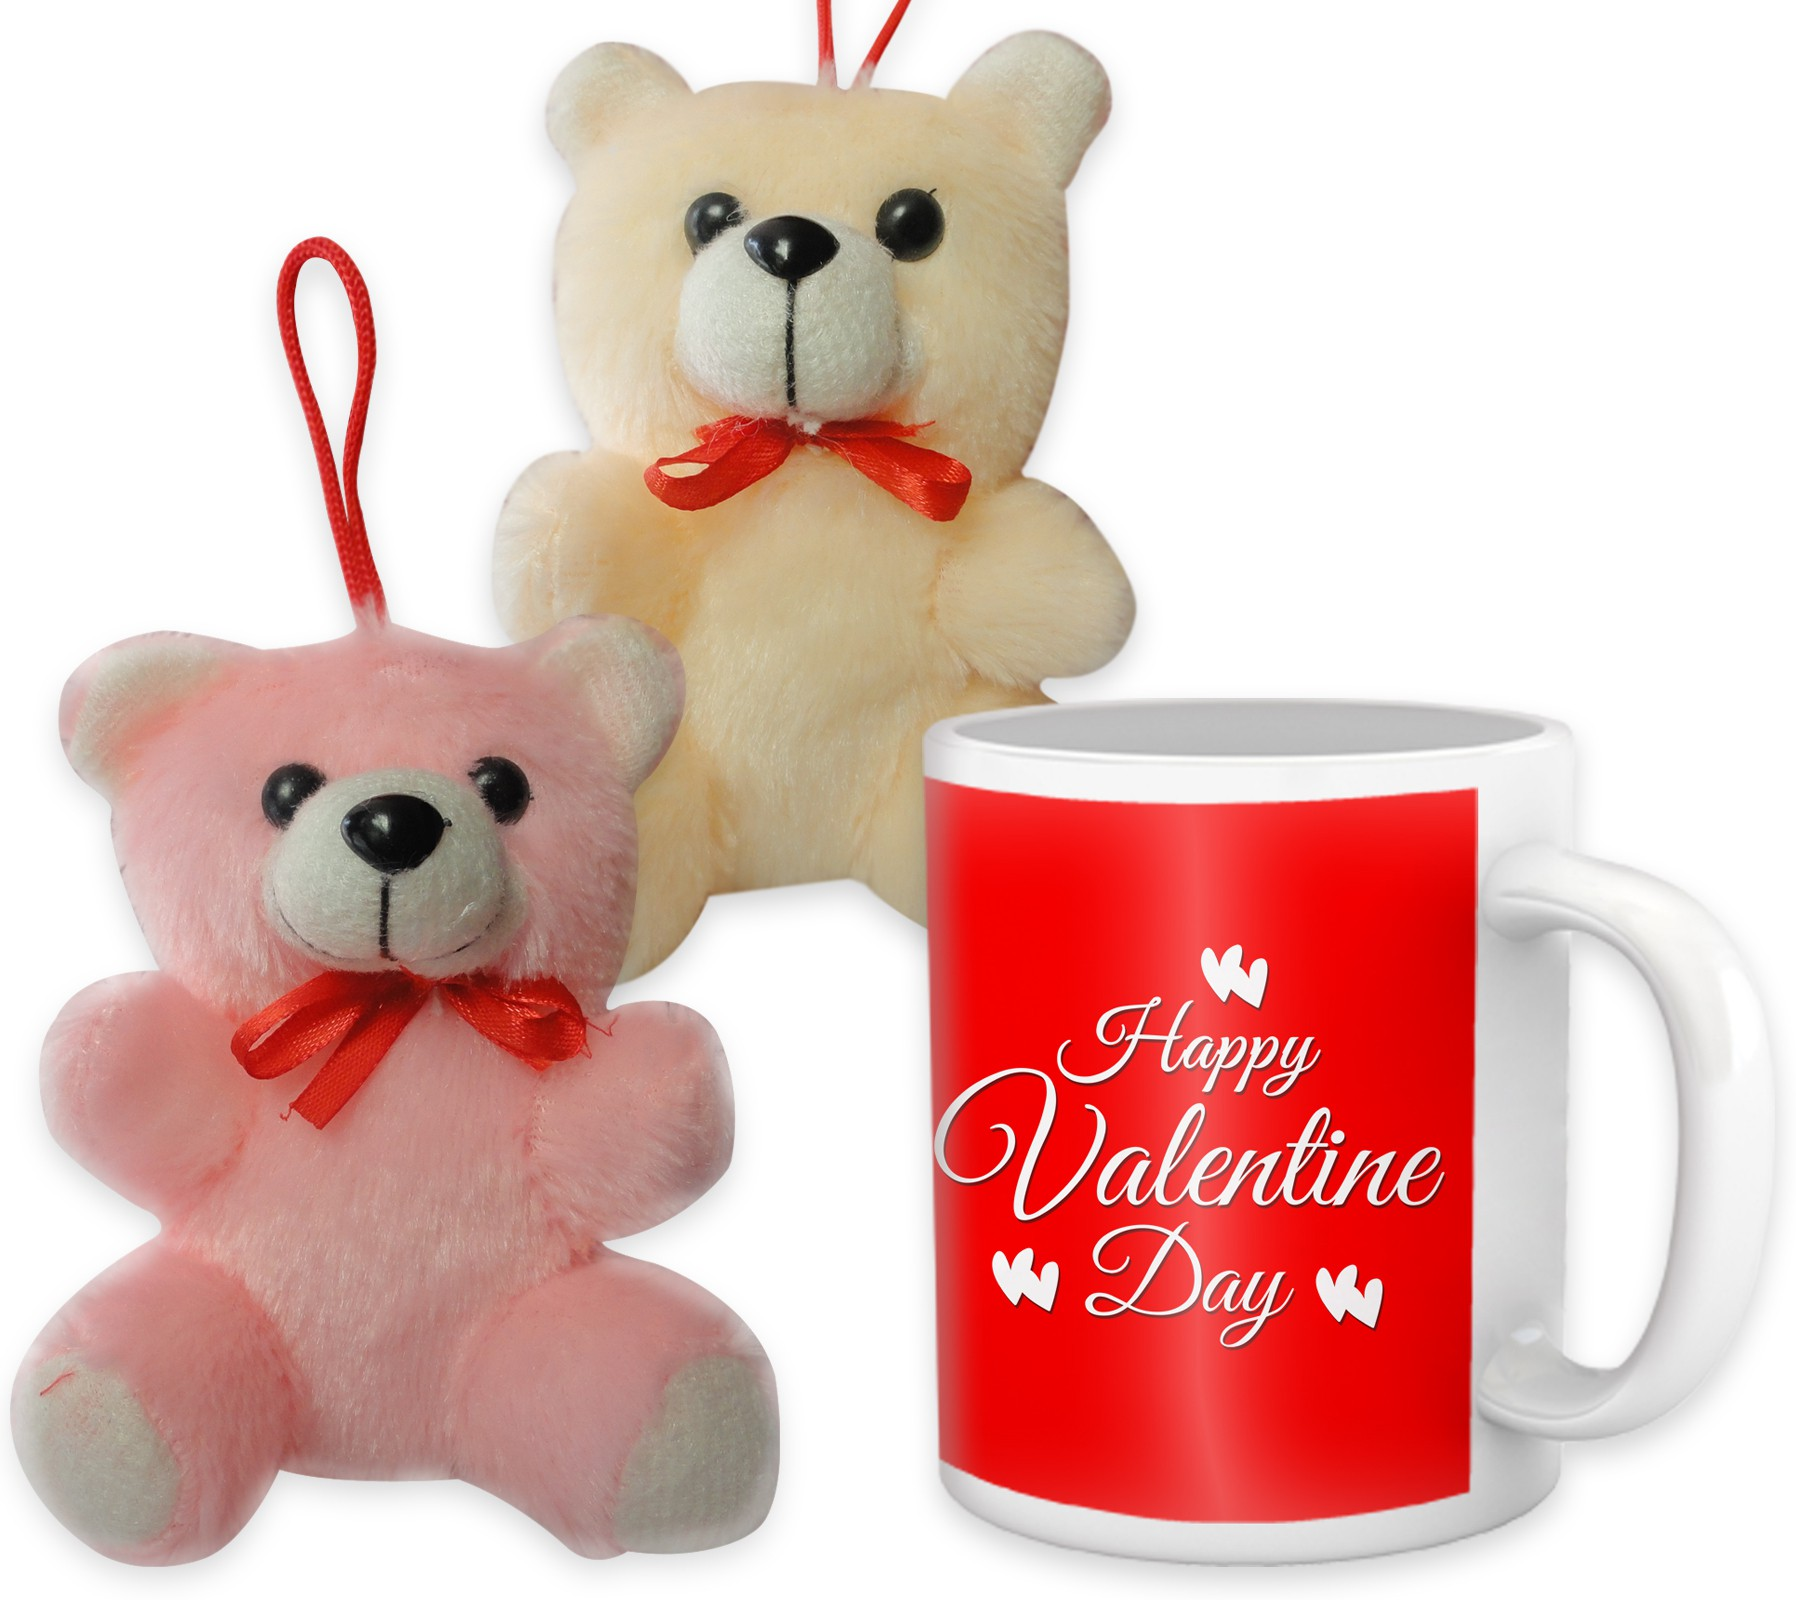 Baby Gift Set Flipkart : Tiedribbons mugtaddy valentine gift set buy